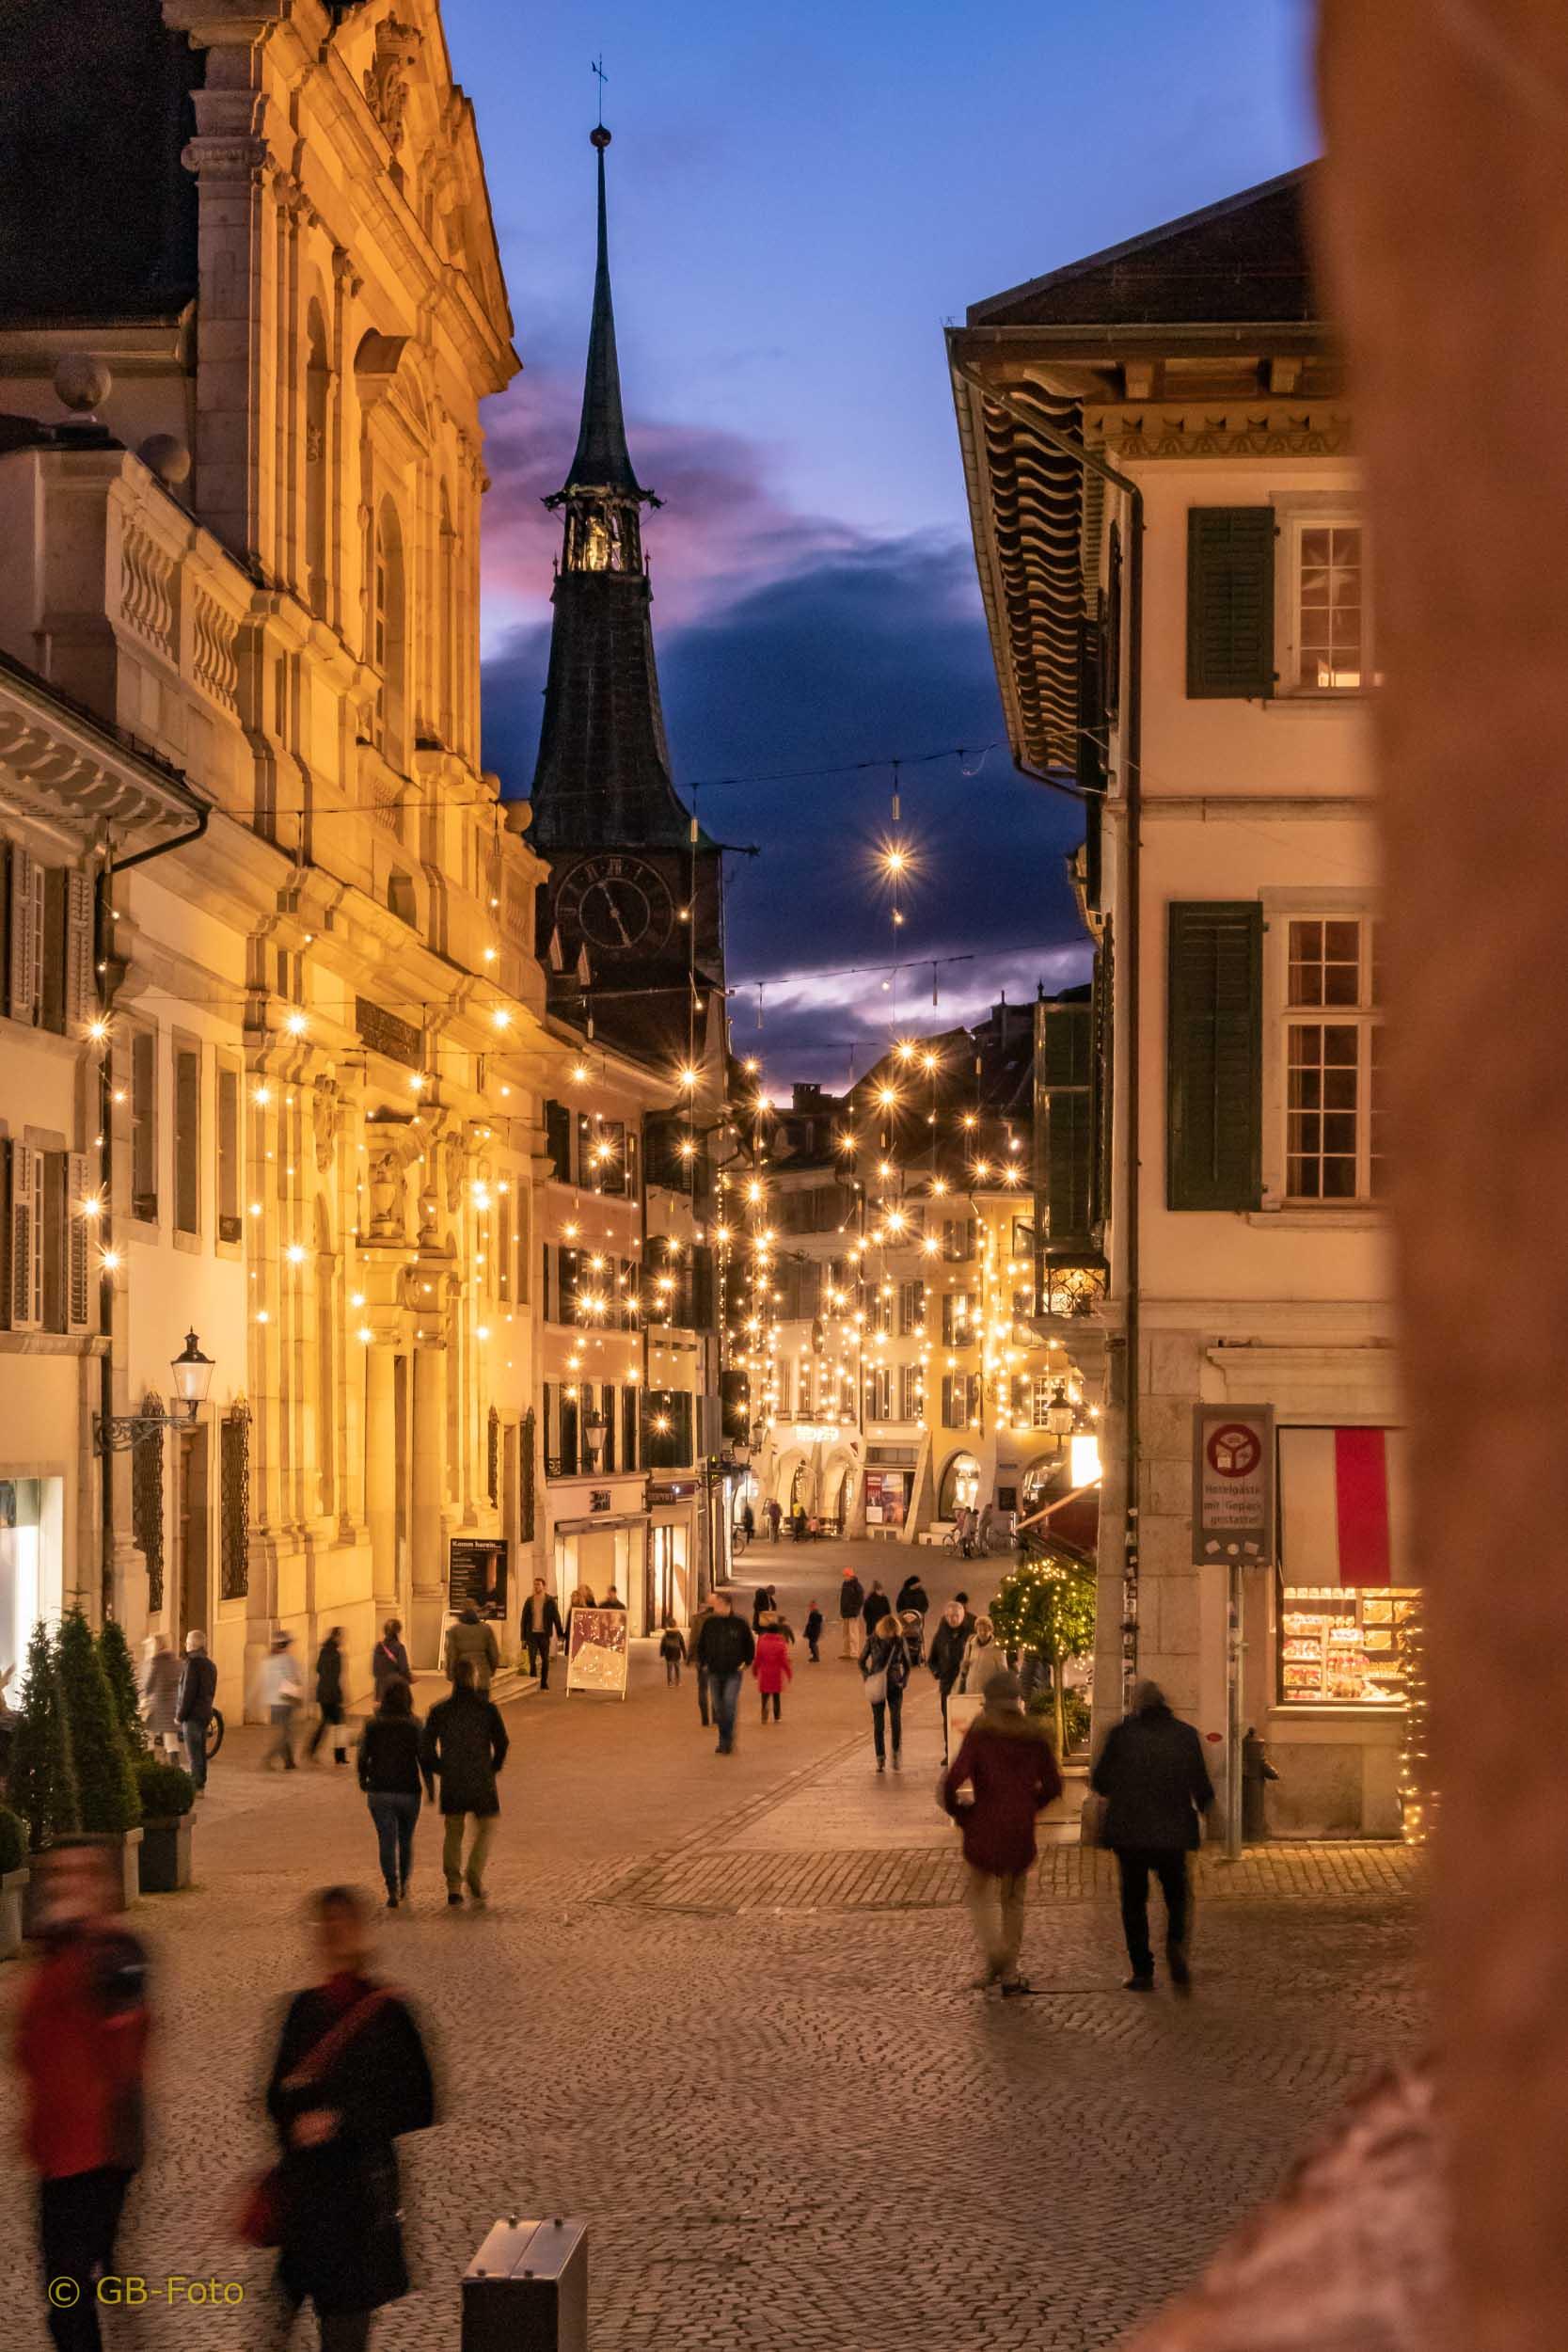 Seniorenbummel Solothurn 07.12.2019